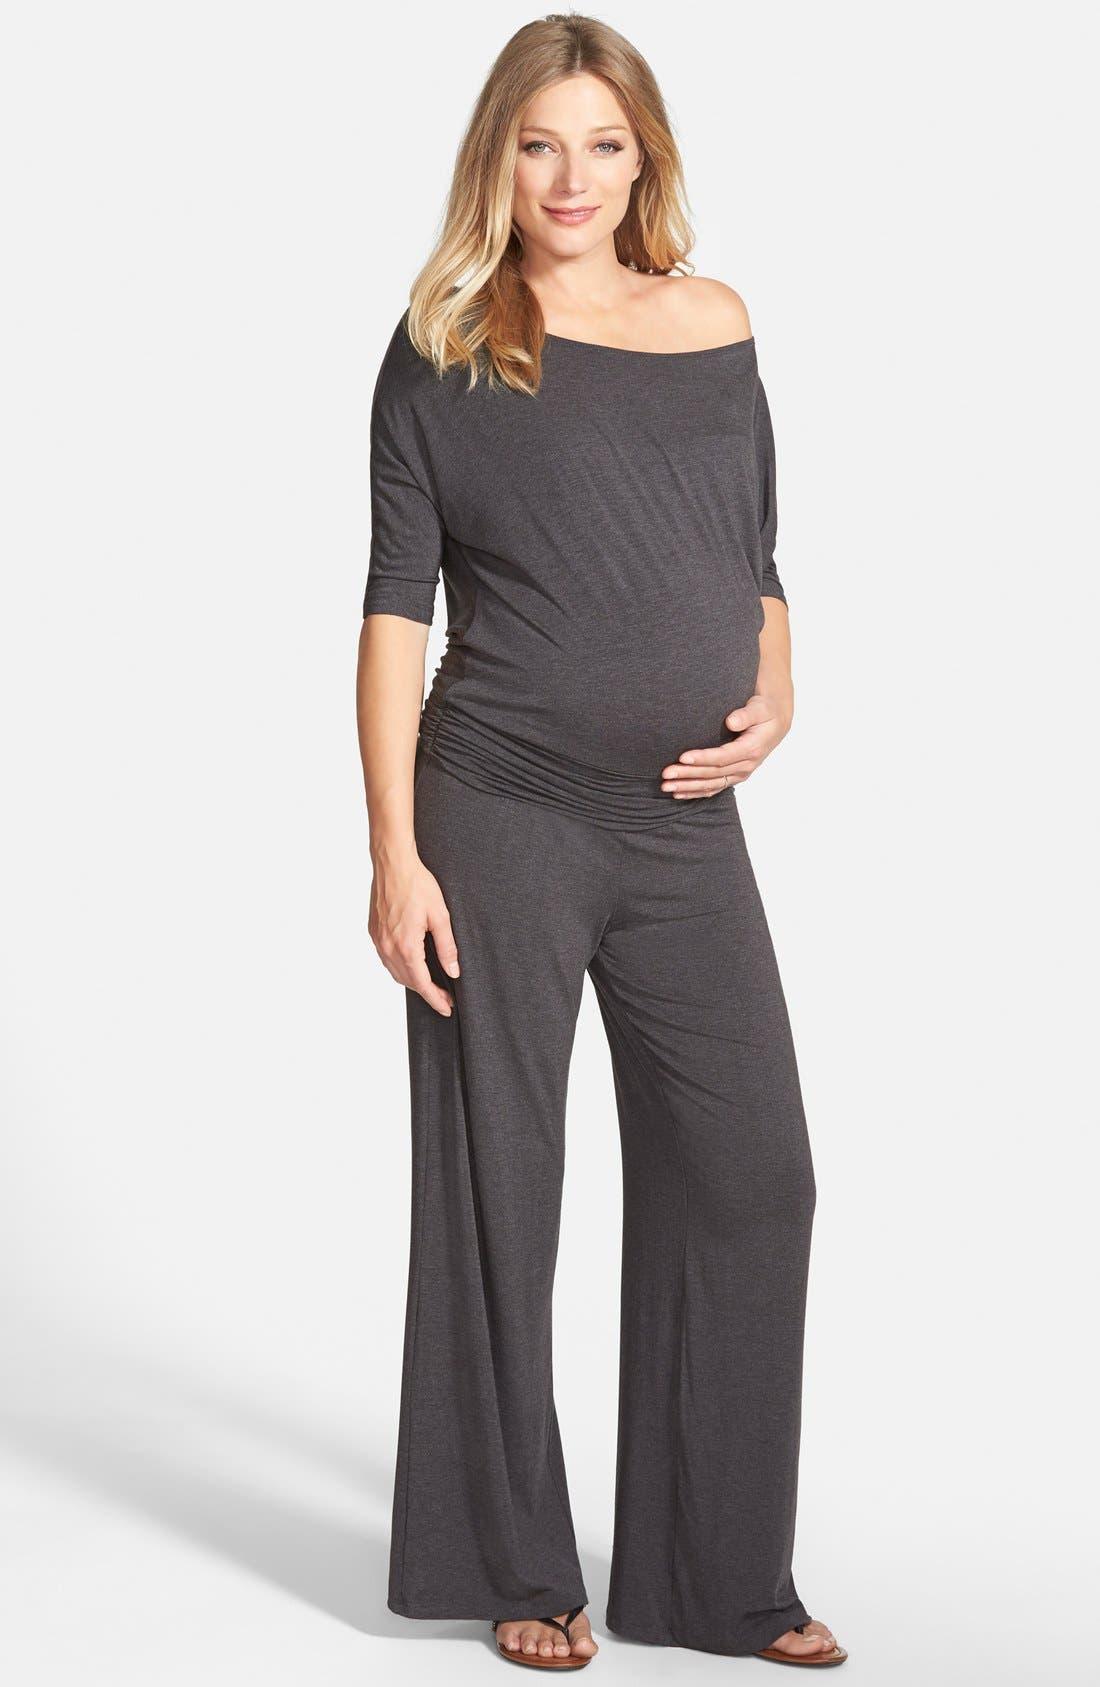 Alternate Image 1 Selected - Tart Maternity 'Michelle' Maternity Jumpsuit